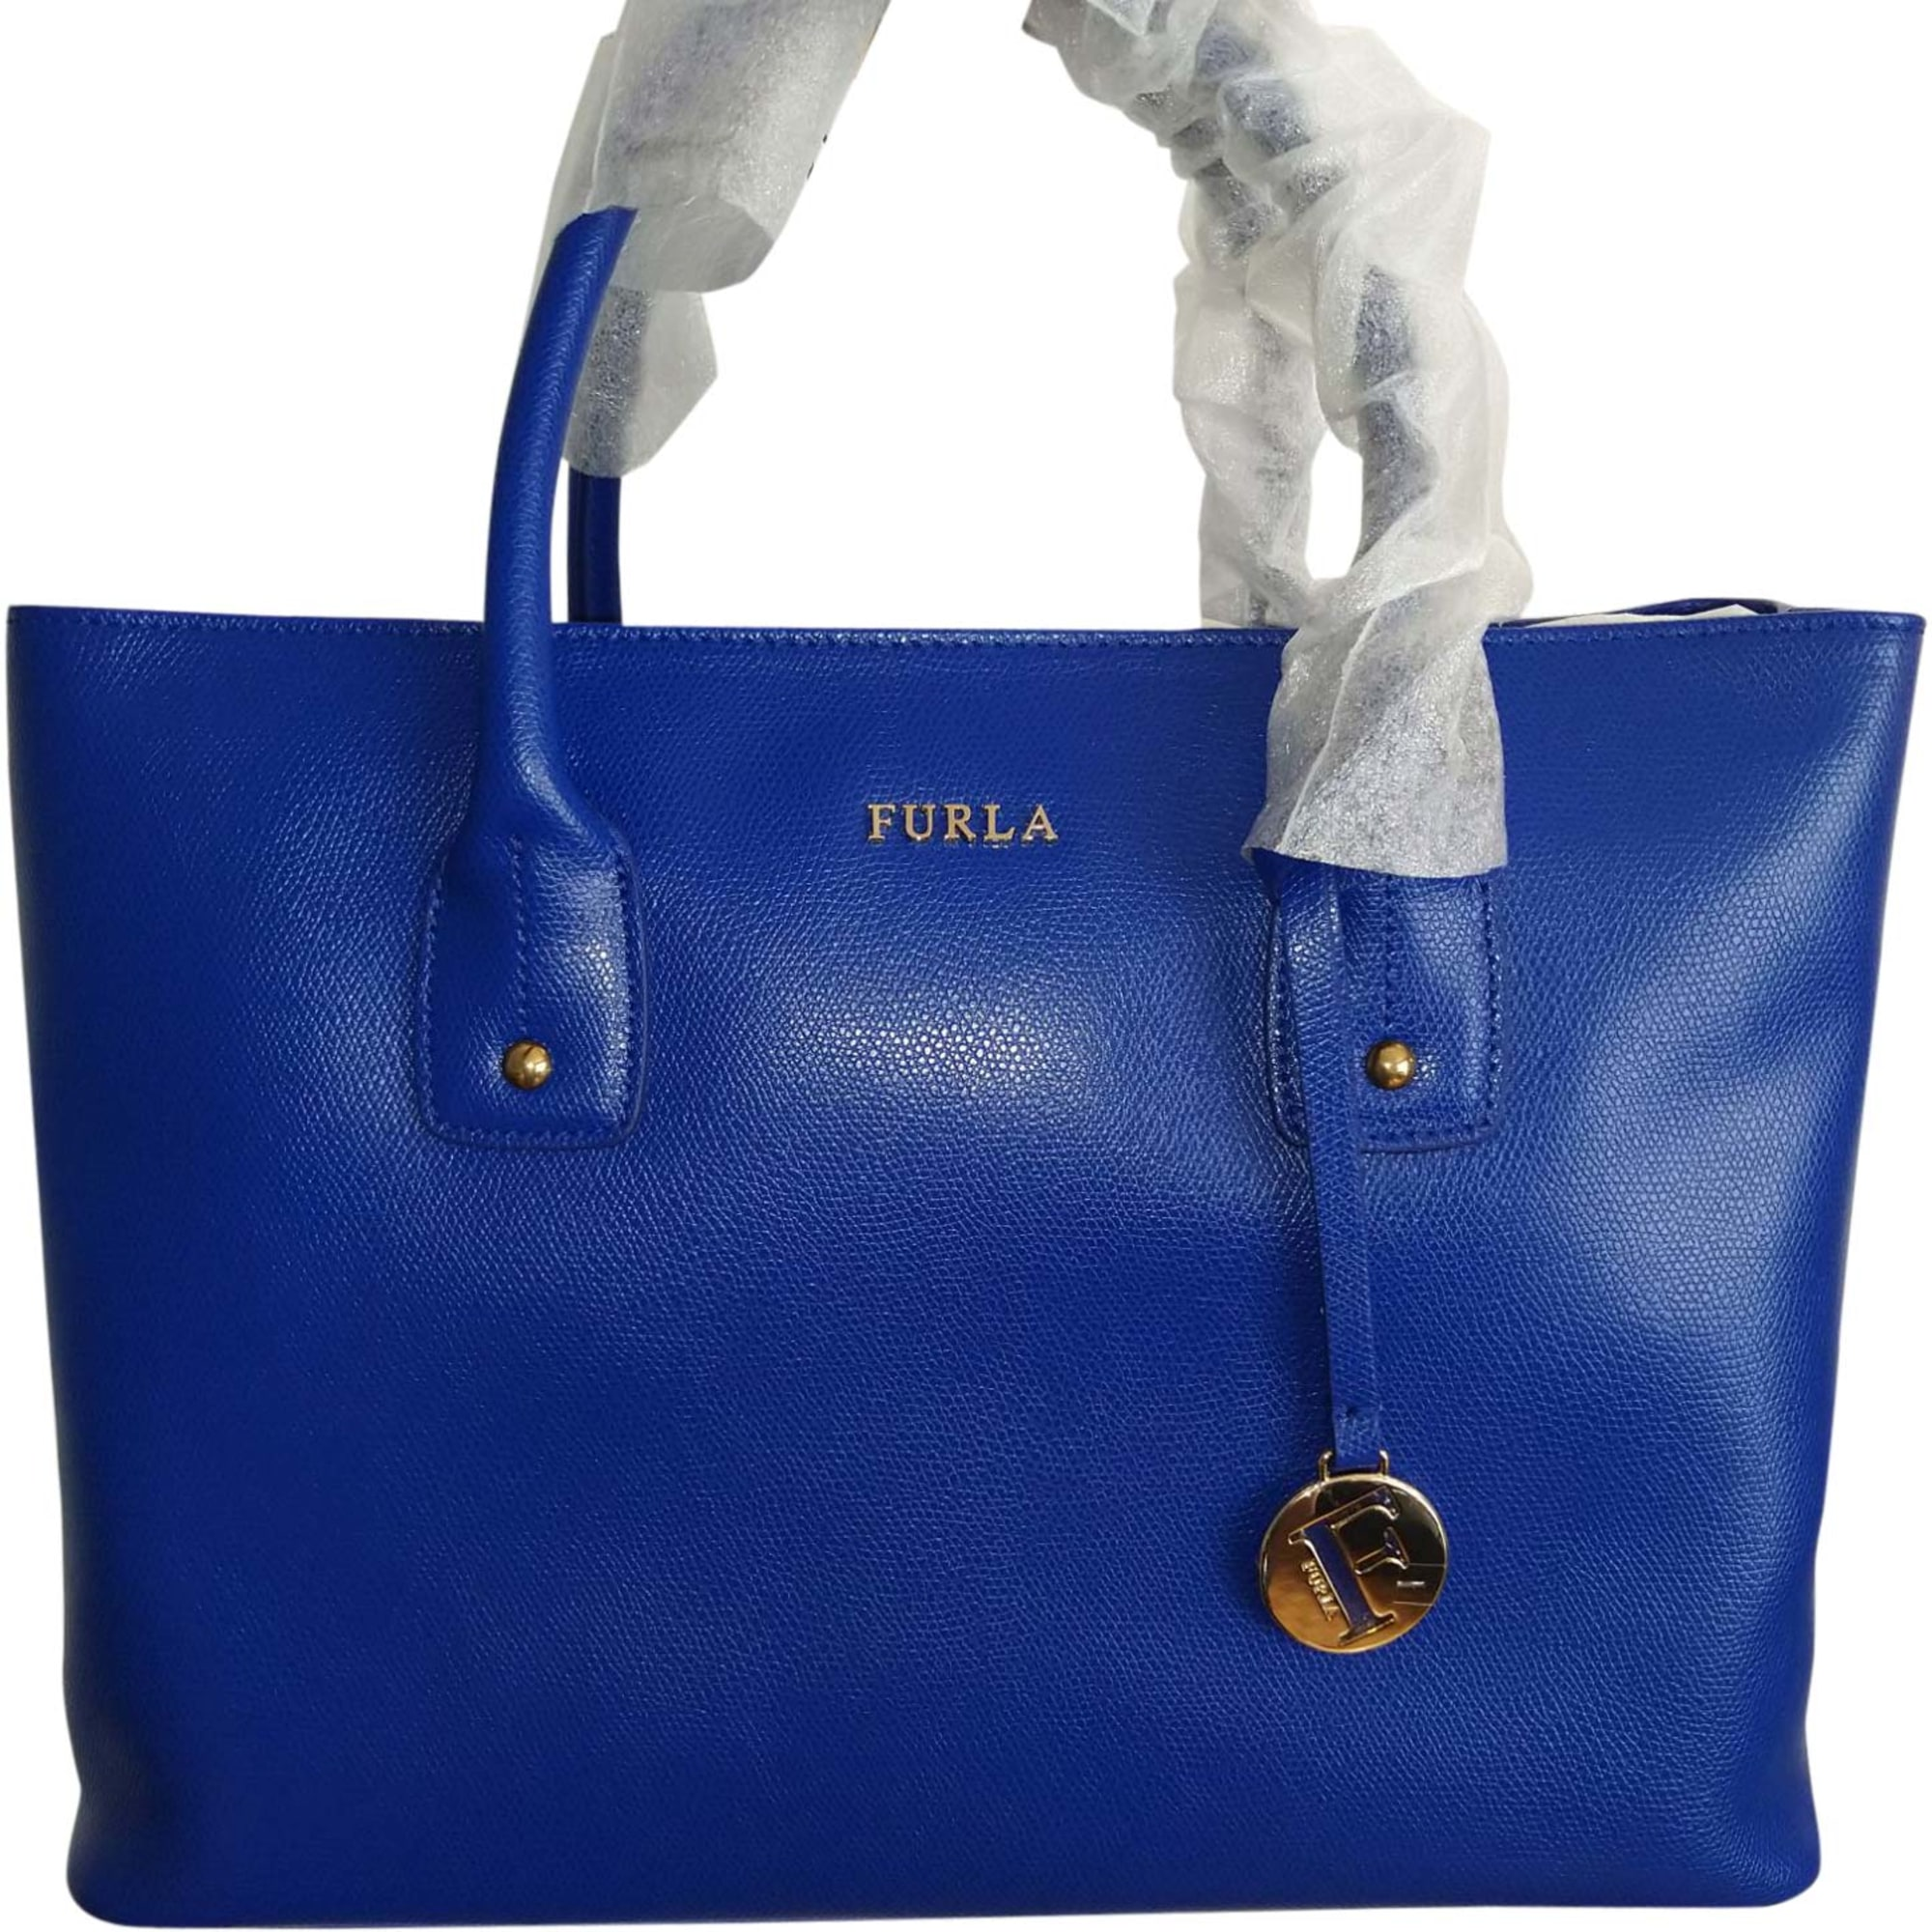 Sac à main en cuir FURLA Bleu, bleu marine, bleu turquoise